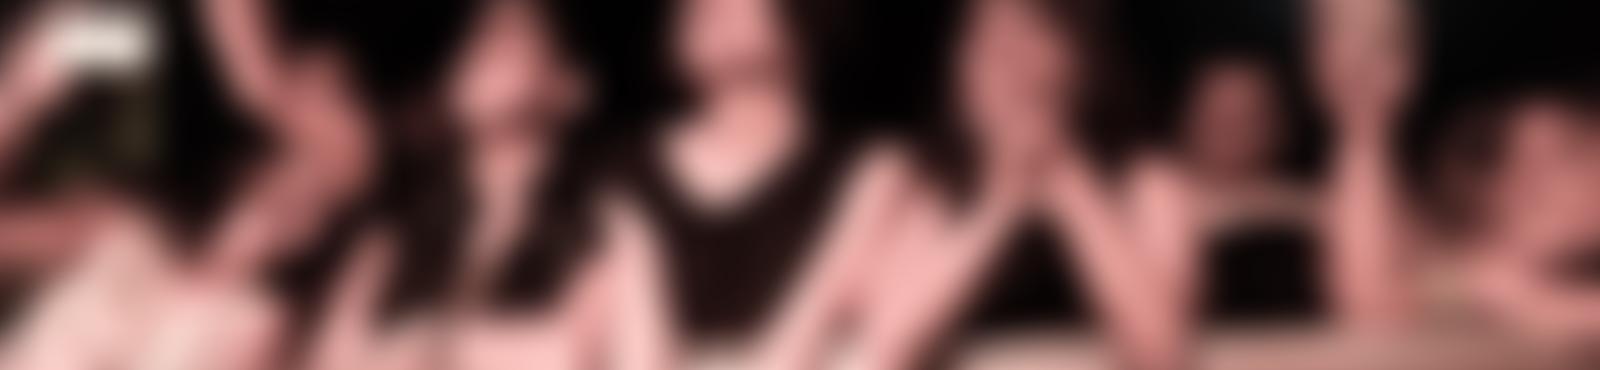 Blurred 02820623 91d6 4f9c a2f1 82ebfcadfcf6